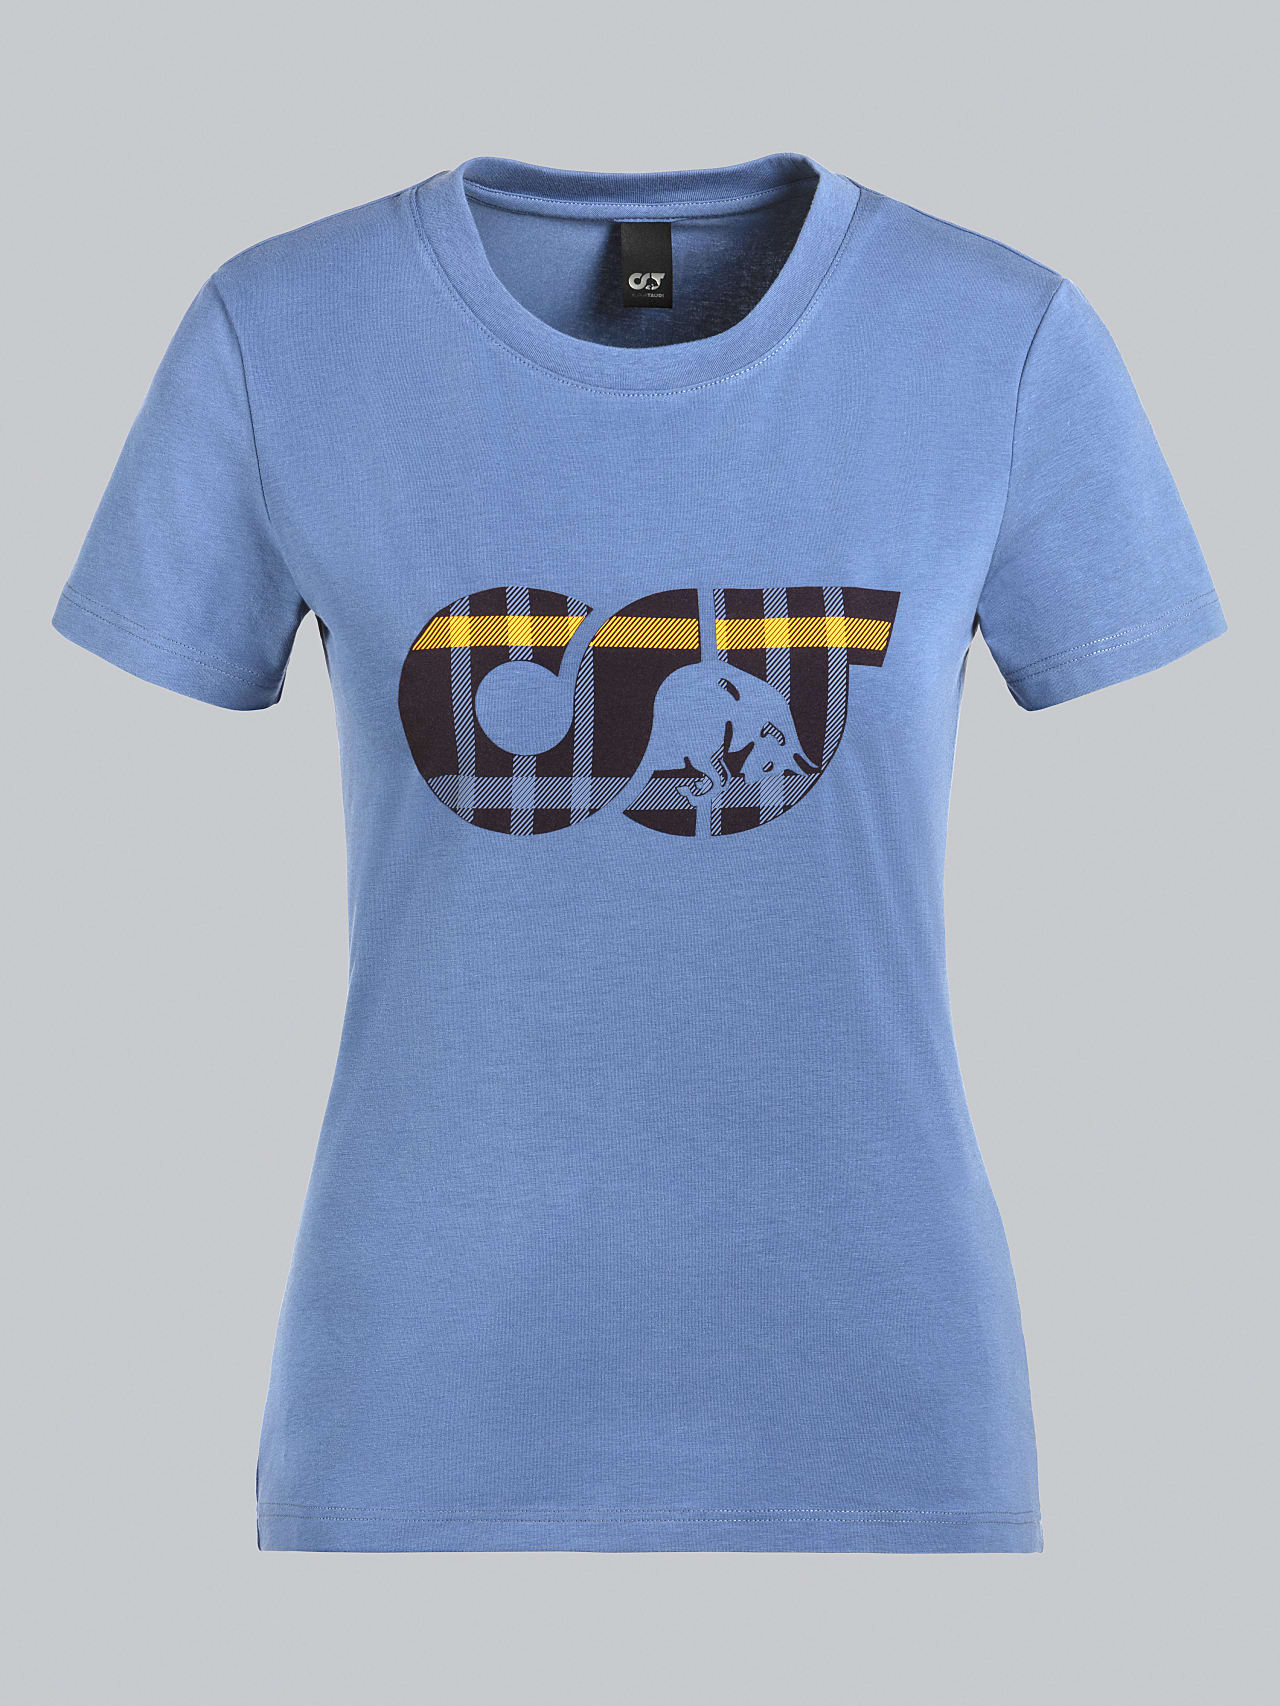 JANPA V1.Y5.02 Logo Print T-Shirt light blue Back Alpha Tauri